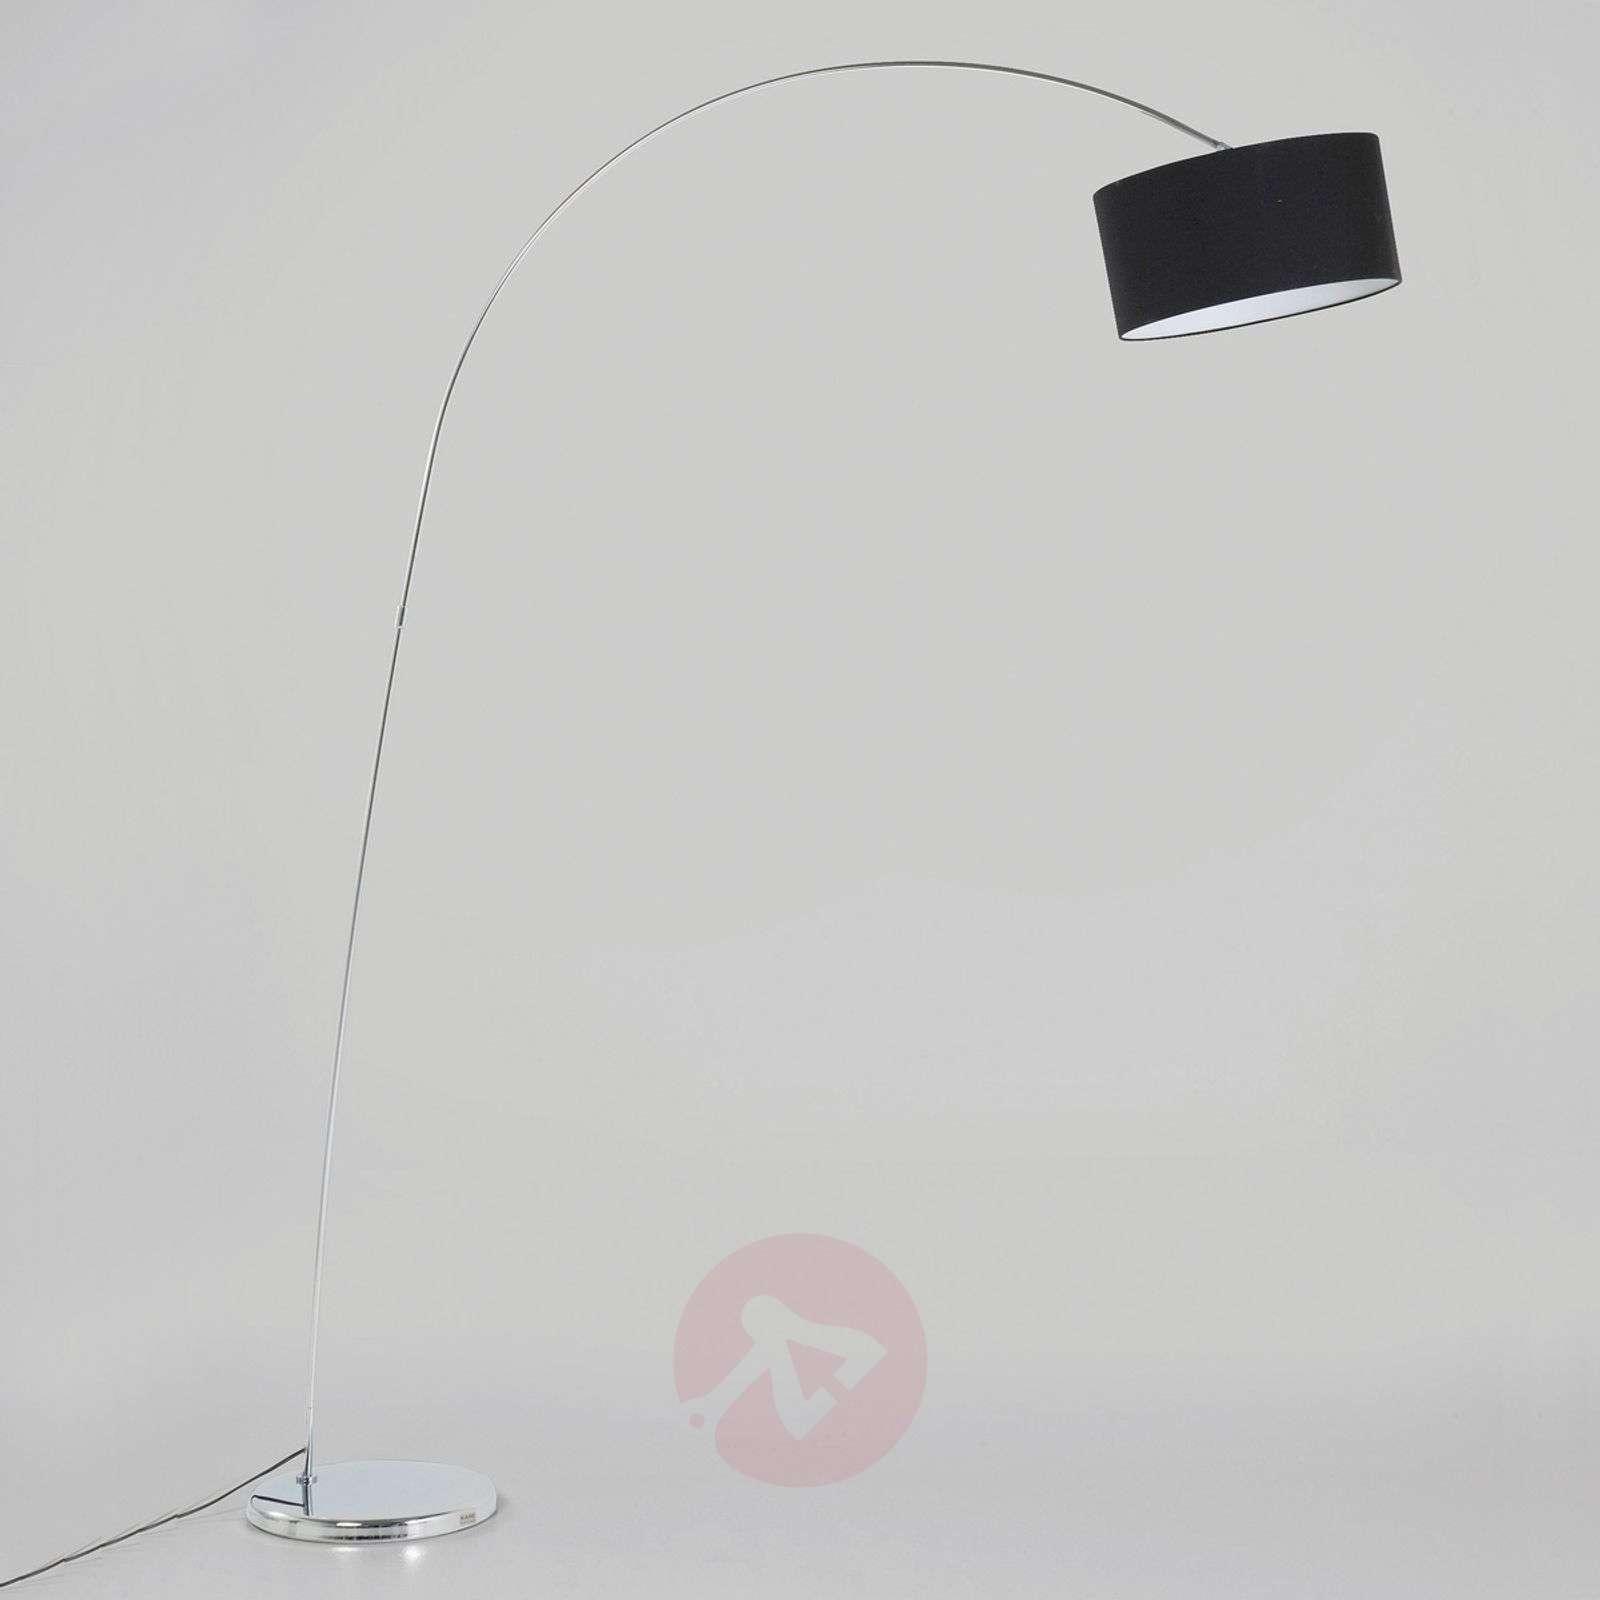 Kare Gooseneck arc floor lamp with black shade-5517011-01